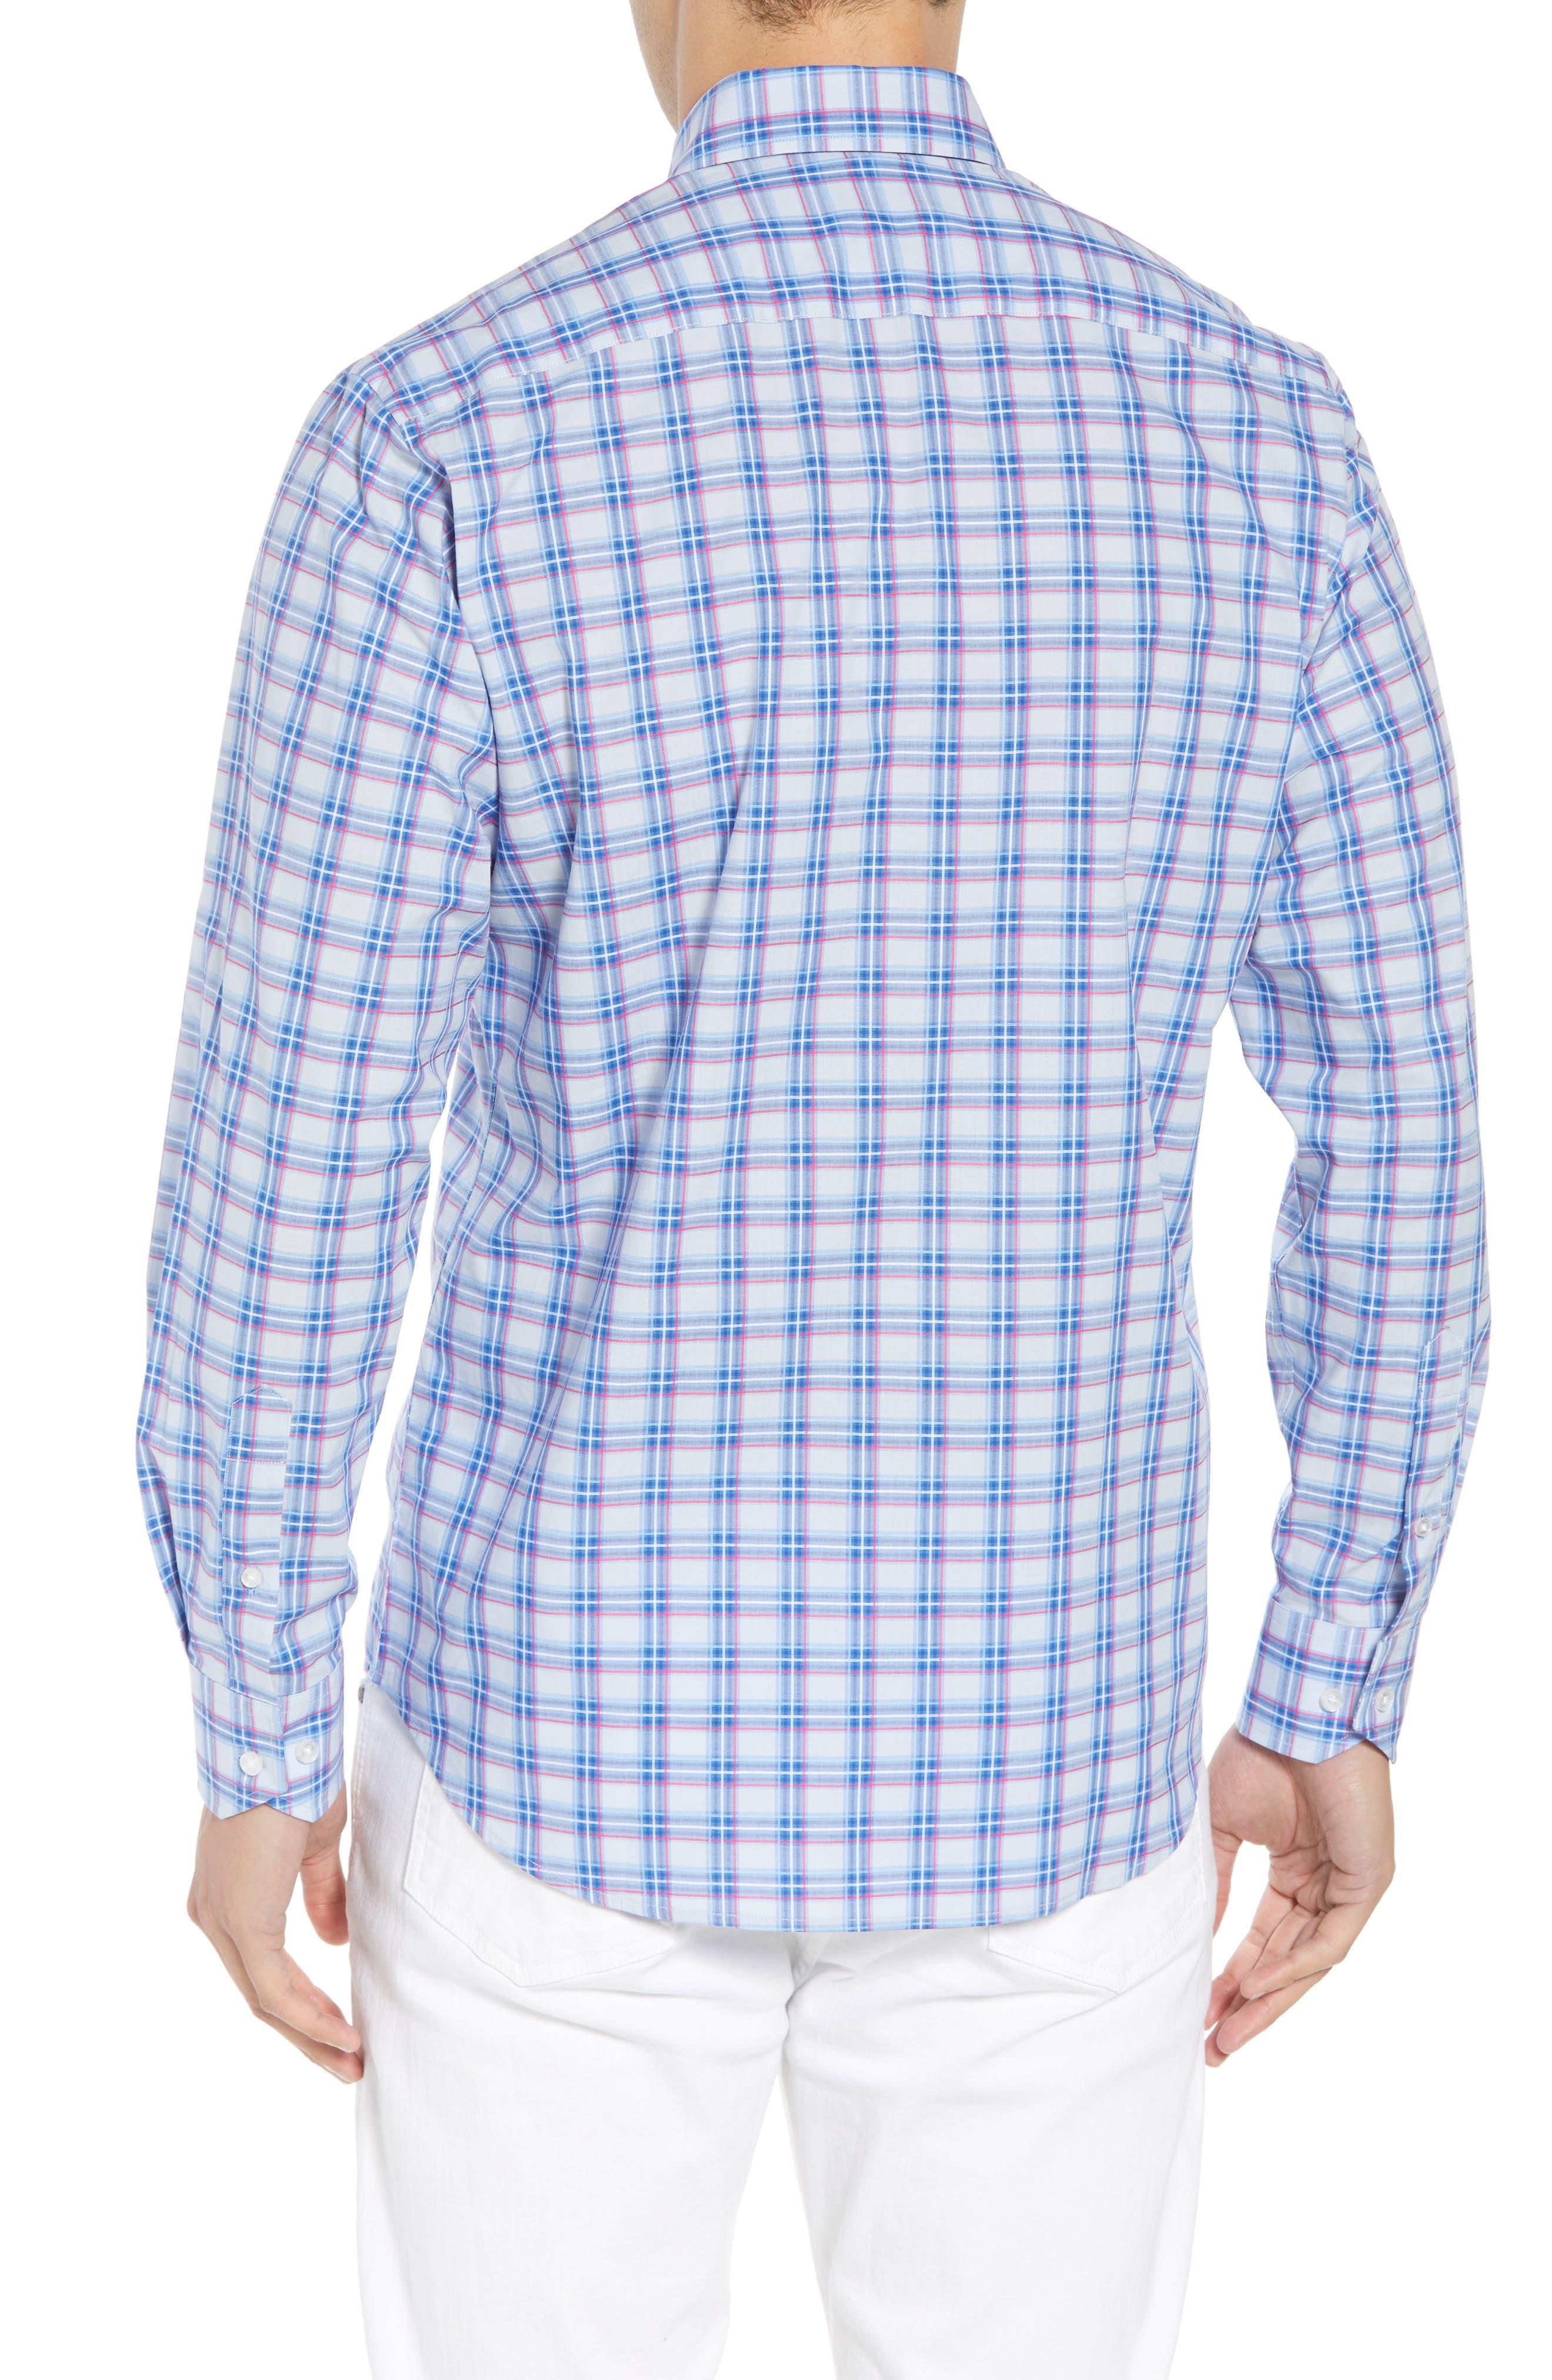 Alvaro Regular Fit Plaid Sport Shirt,                             Alternate thumbnail 2, color,                             450